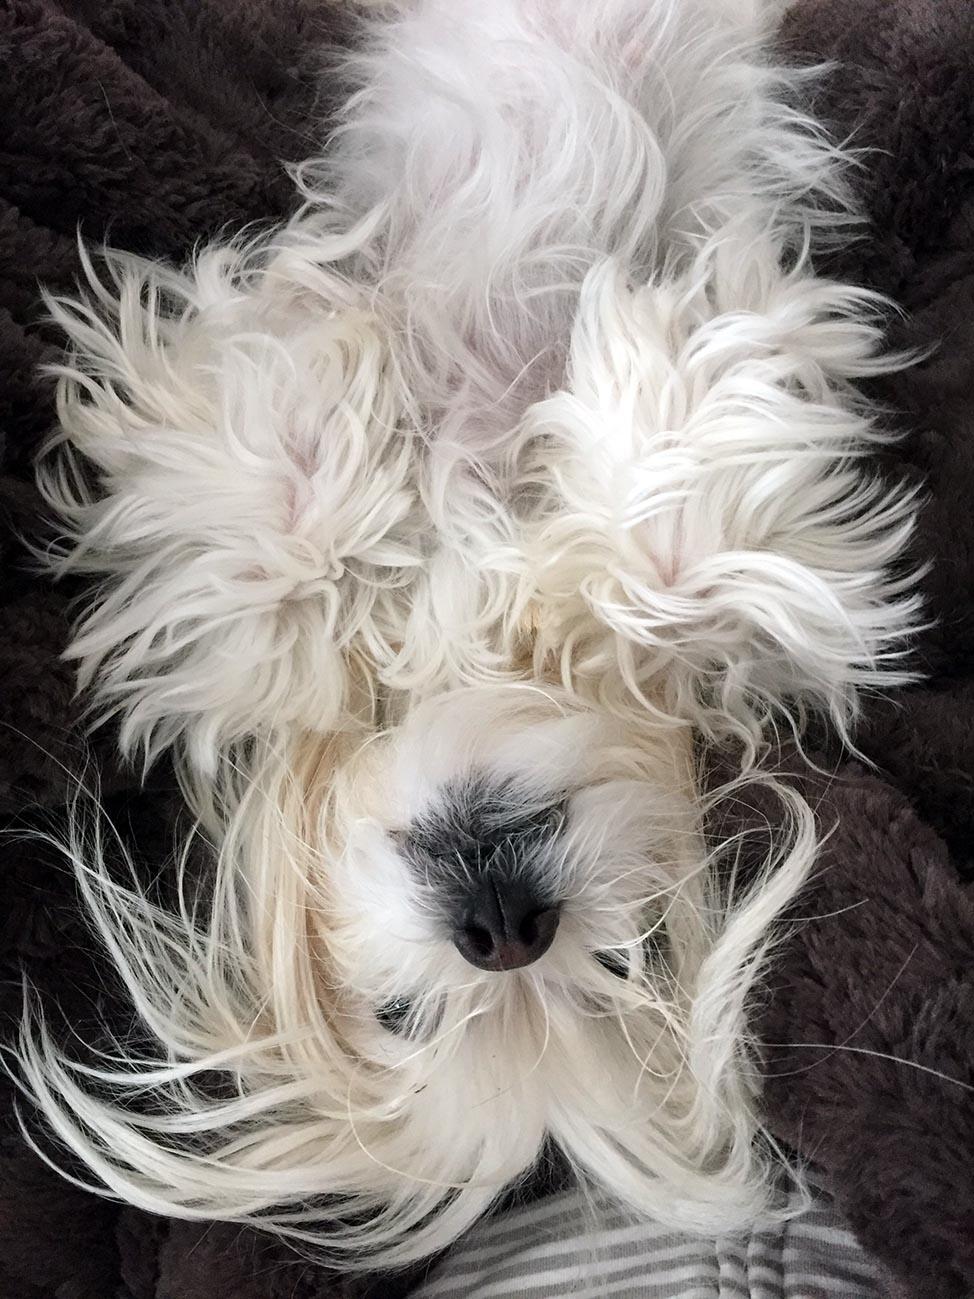 Ella the Dog blogs